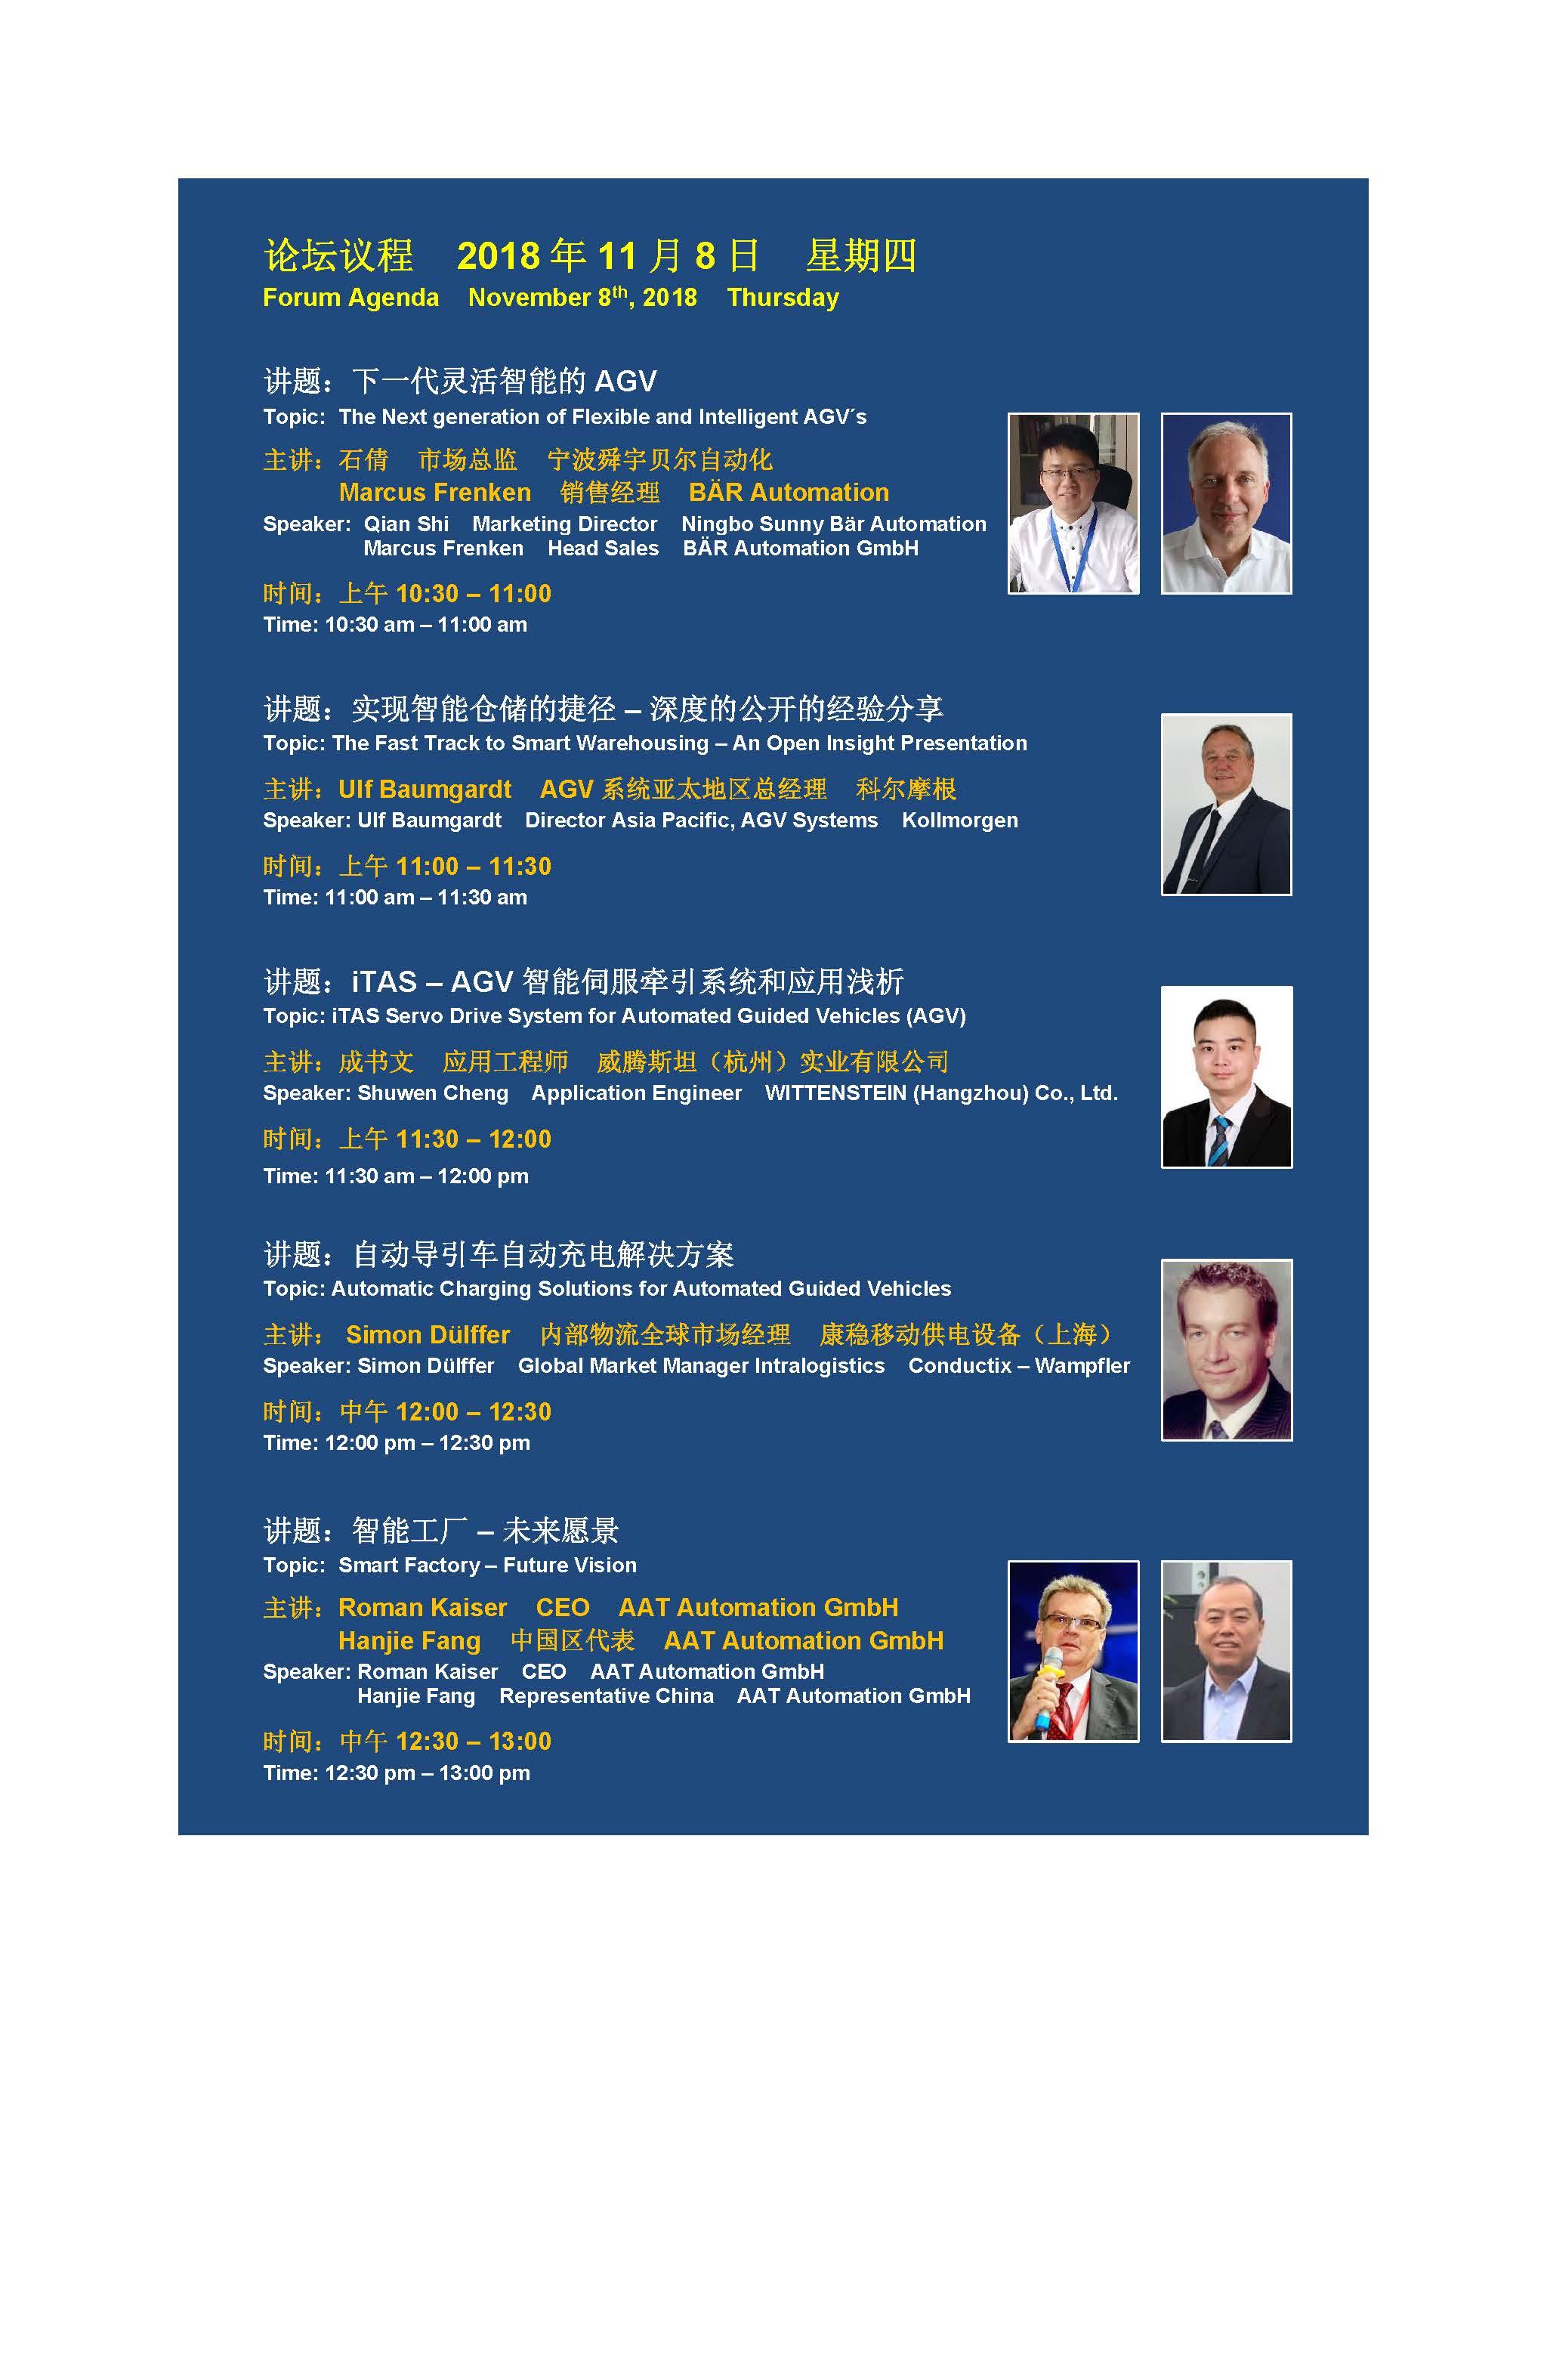 2018CMA004_AGV Forum Program_页面_2.jpg